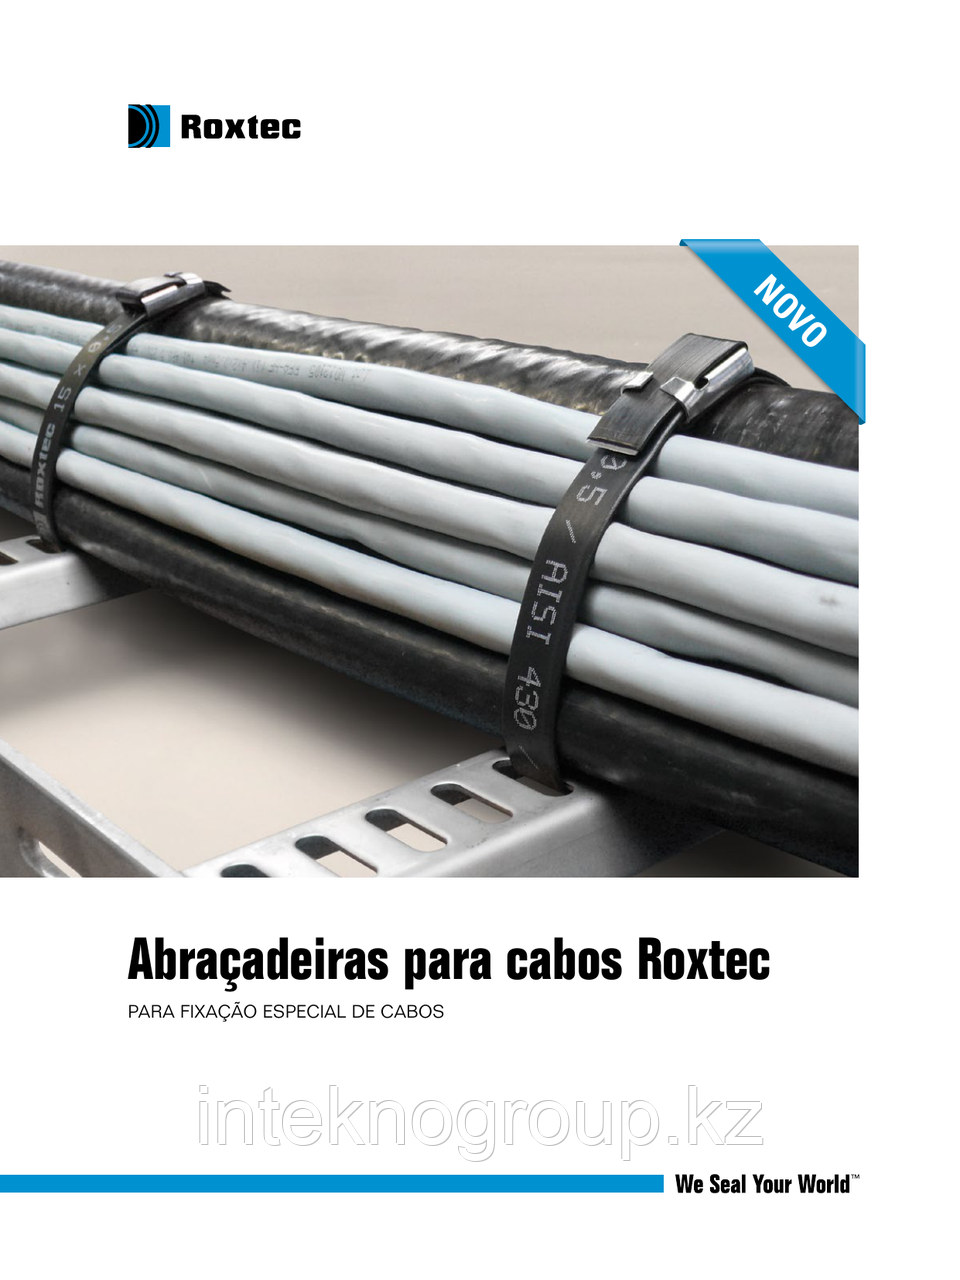 Roxtec Cable straps Strap 15x0,5 black/ss. L=700 mm